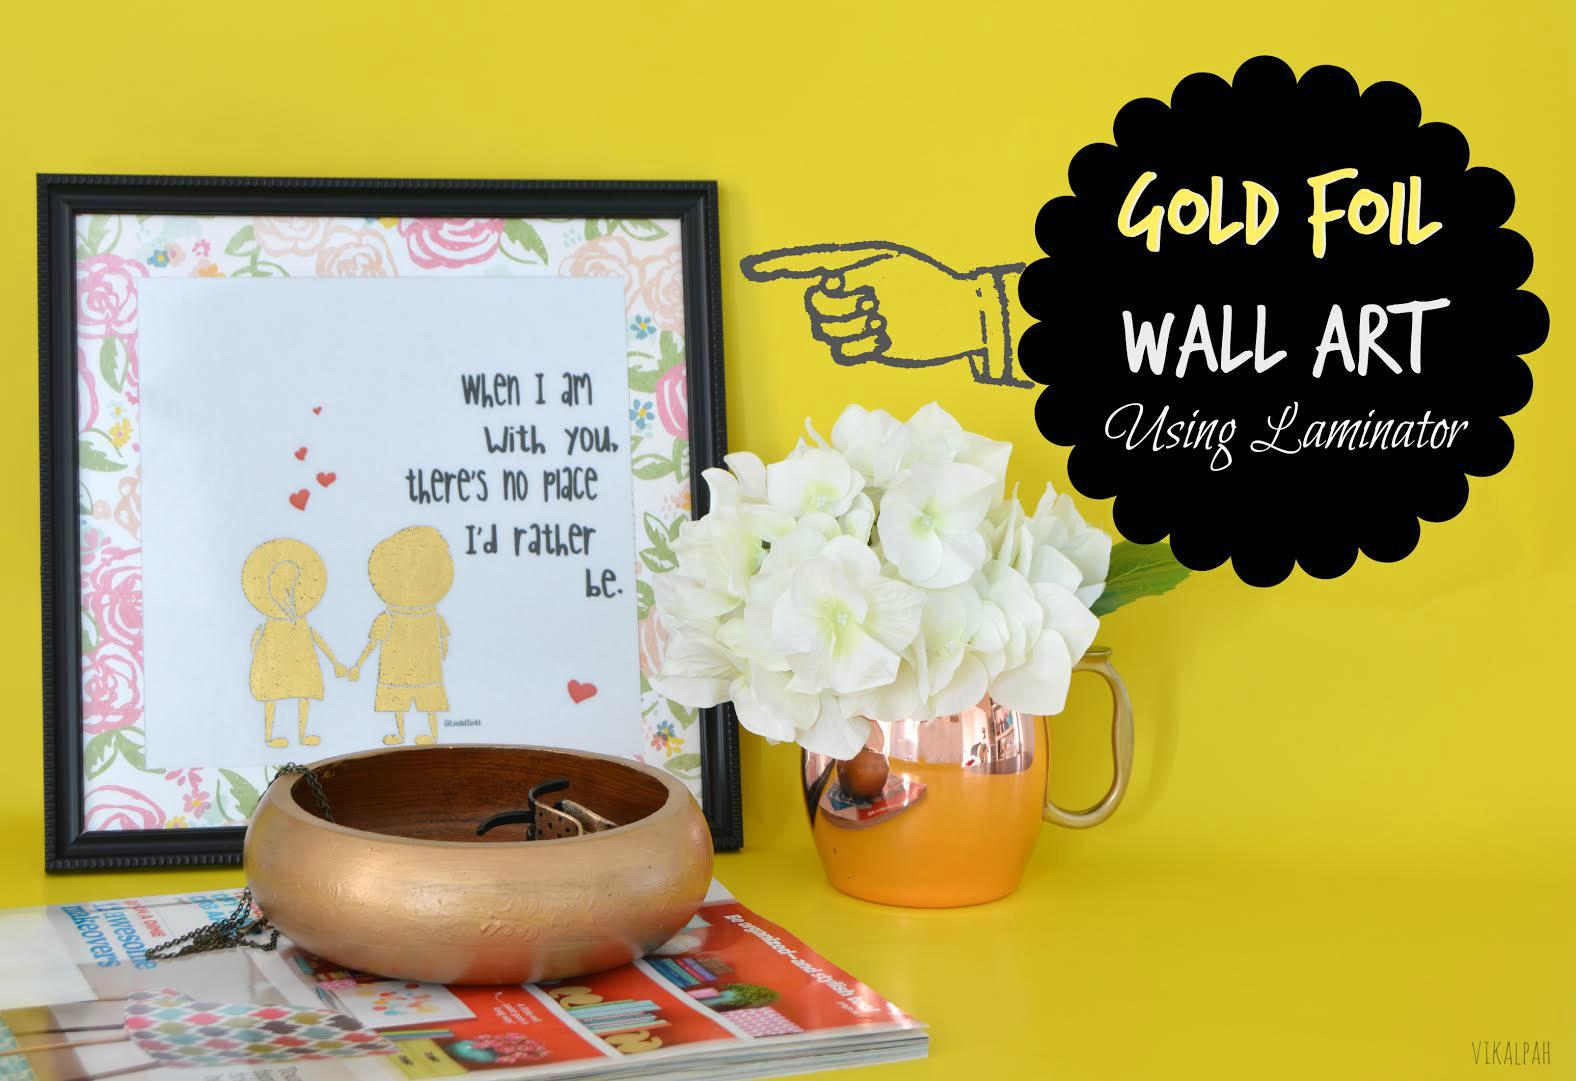 Vikalpah: Gold Foil Wall Art using Laminator